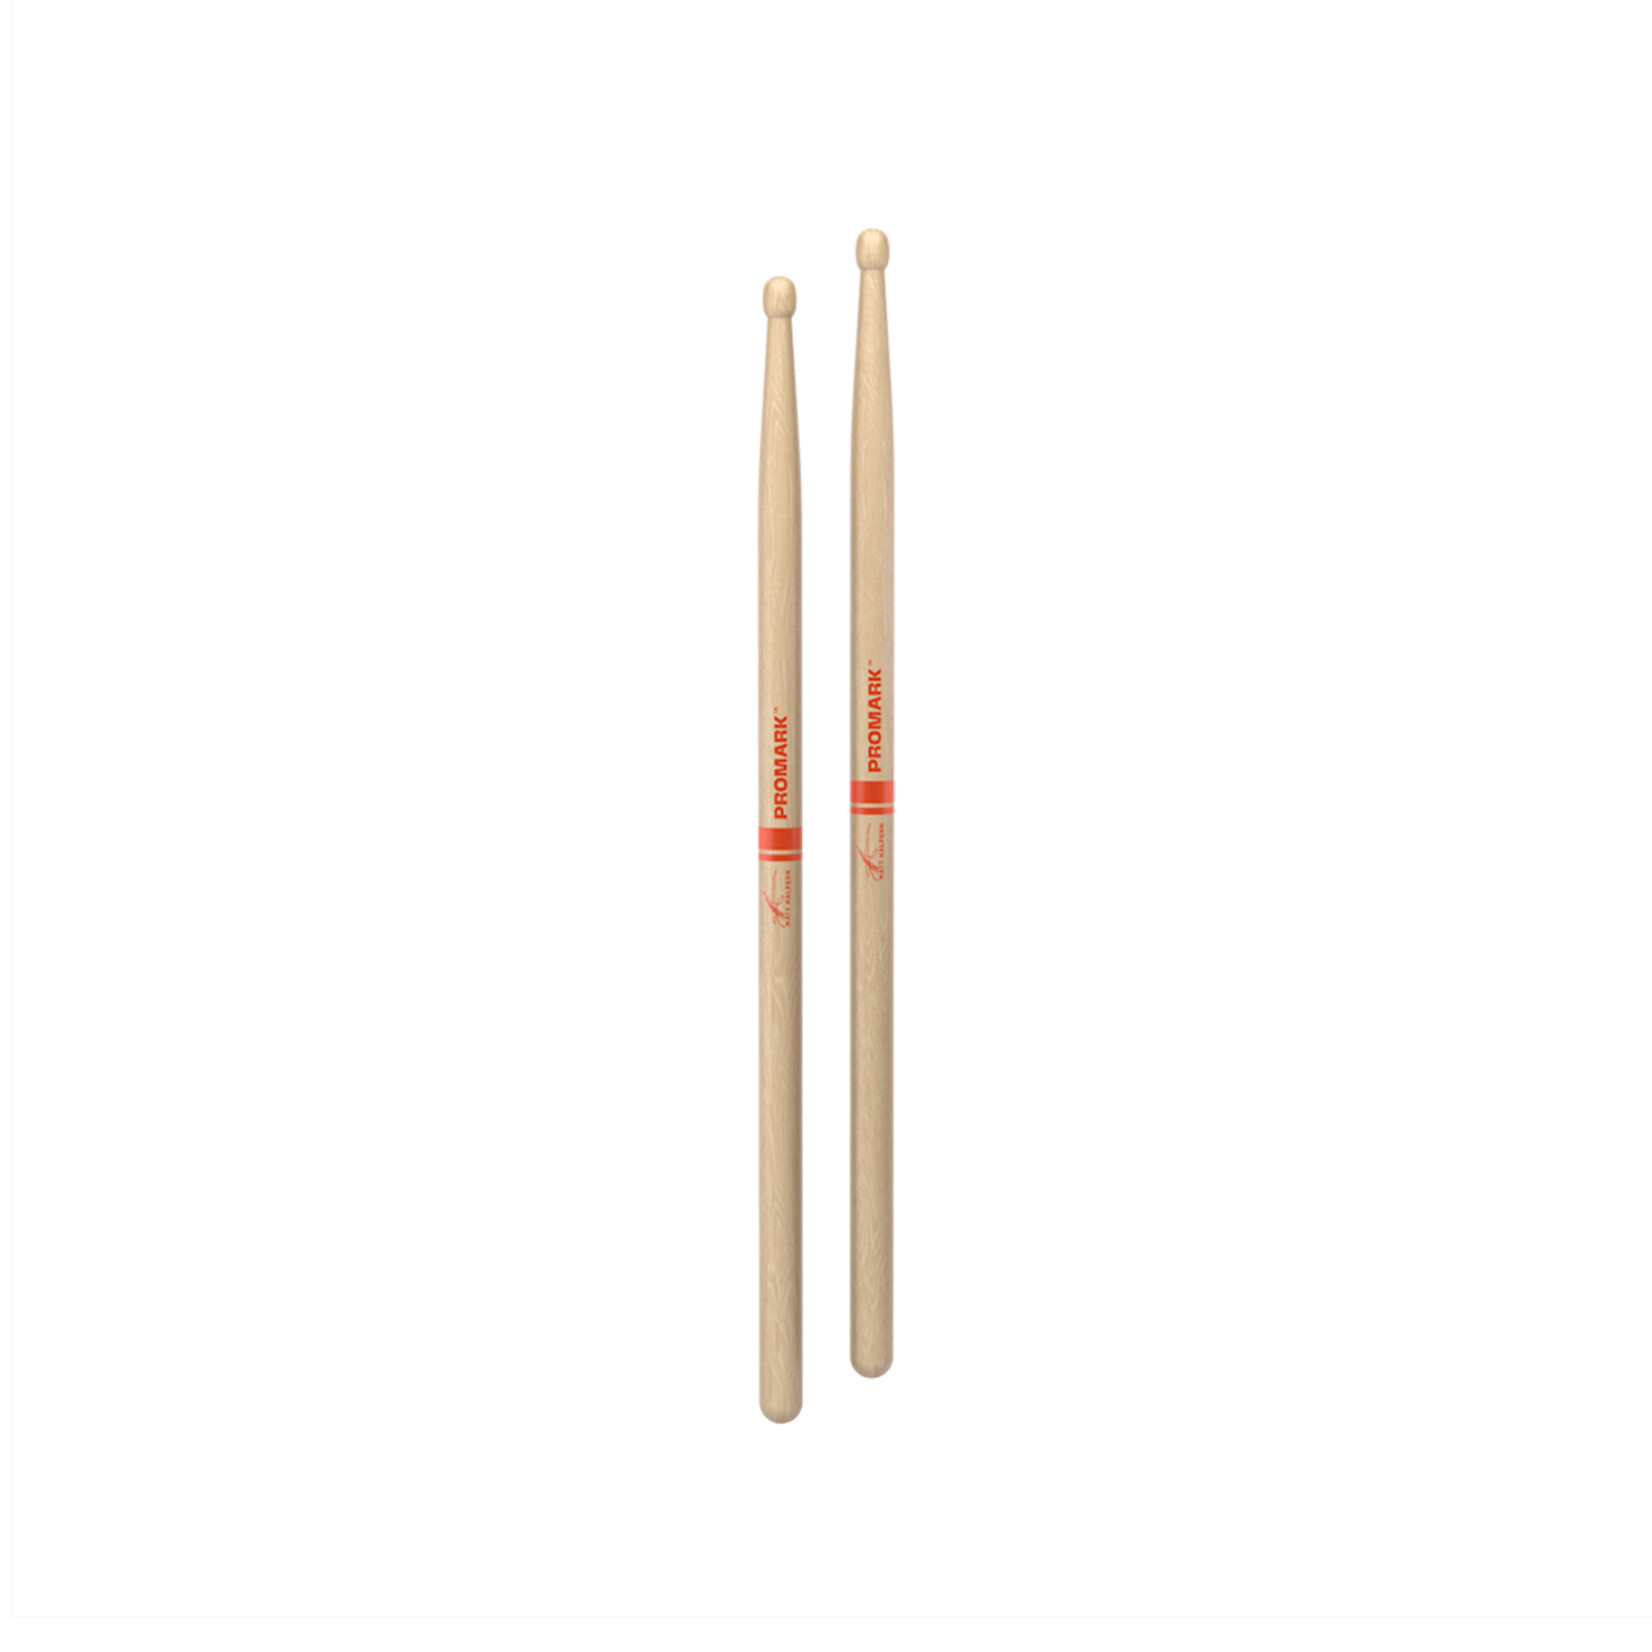 Promark Promark Matt Halpern Hickory Wood Tip Drumstick